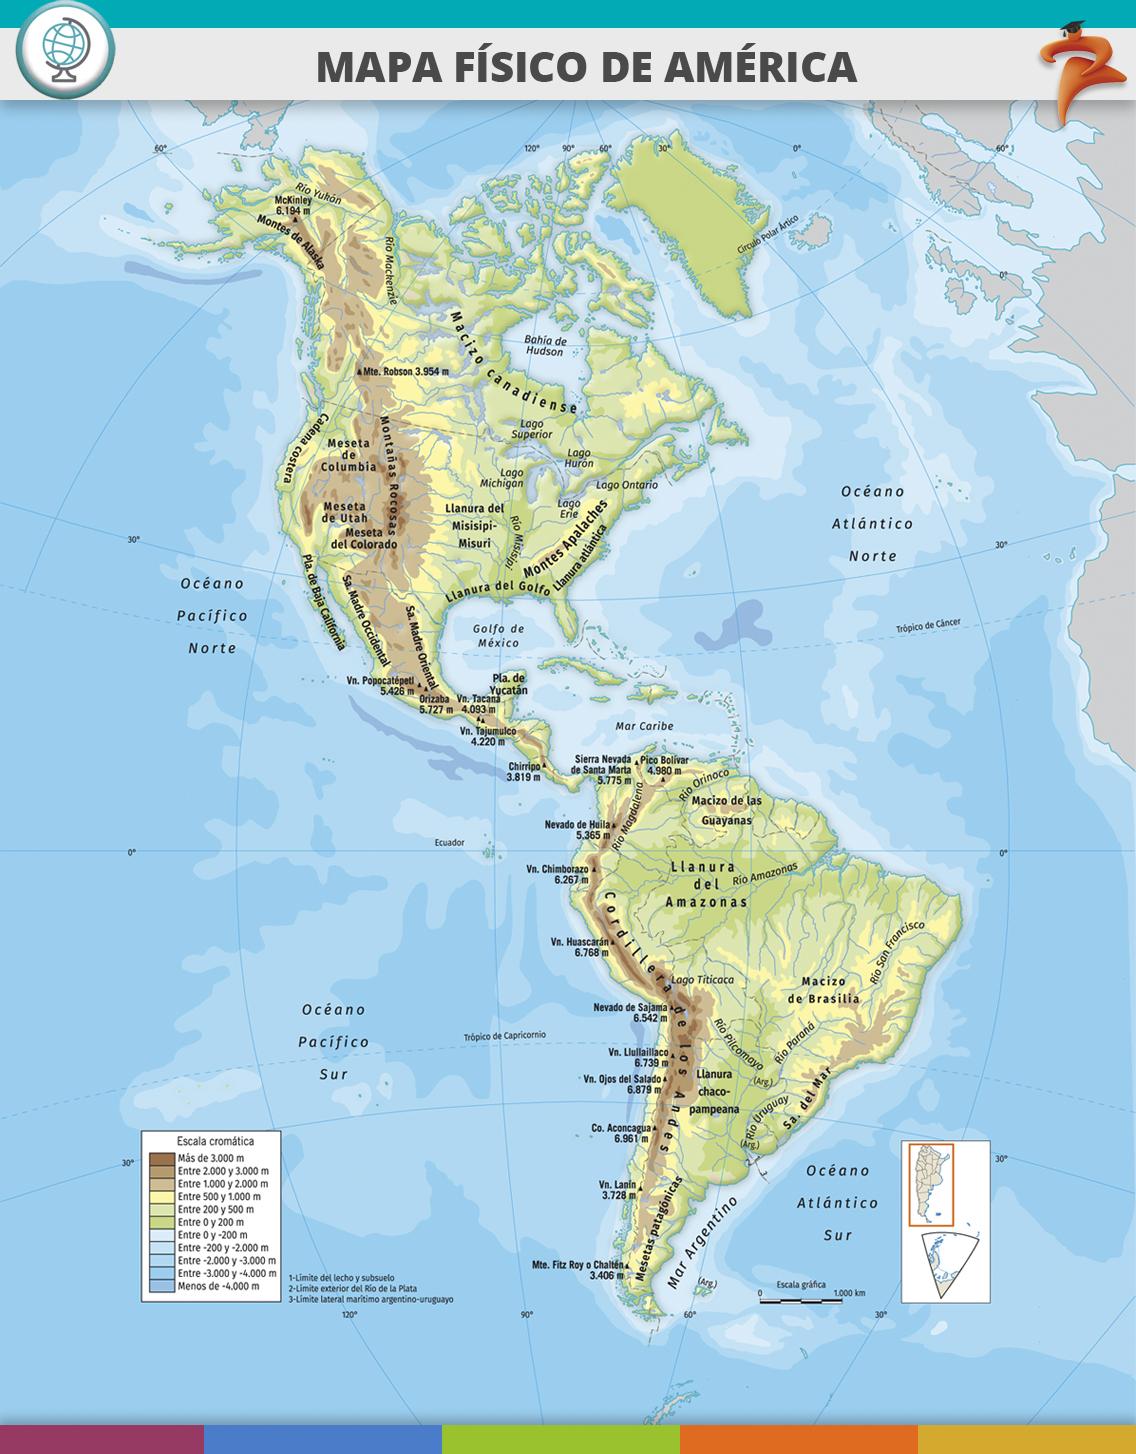 Mapa Fisico De America.Mandioca Digital